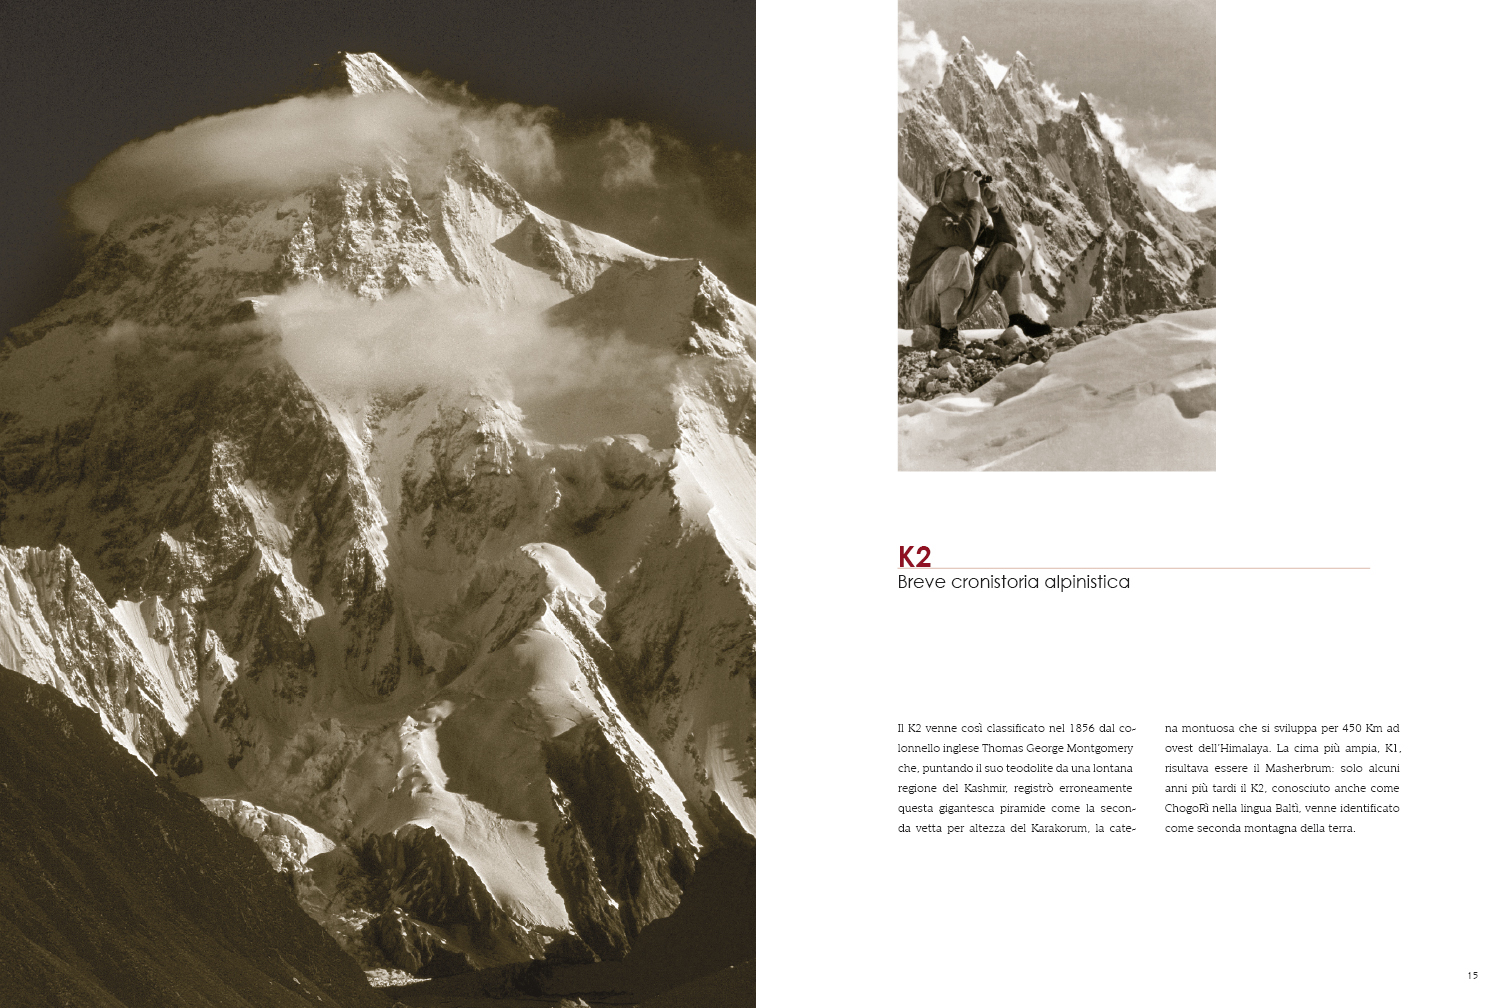 K2 EXPEDITION 1954-2004 Giuseppe Ghedina Fotografo - 009.jpg